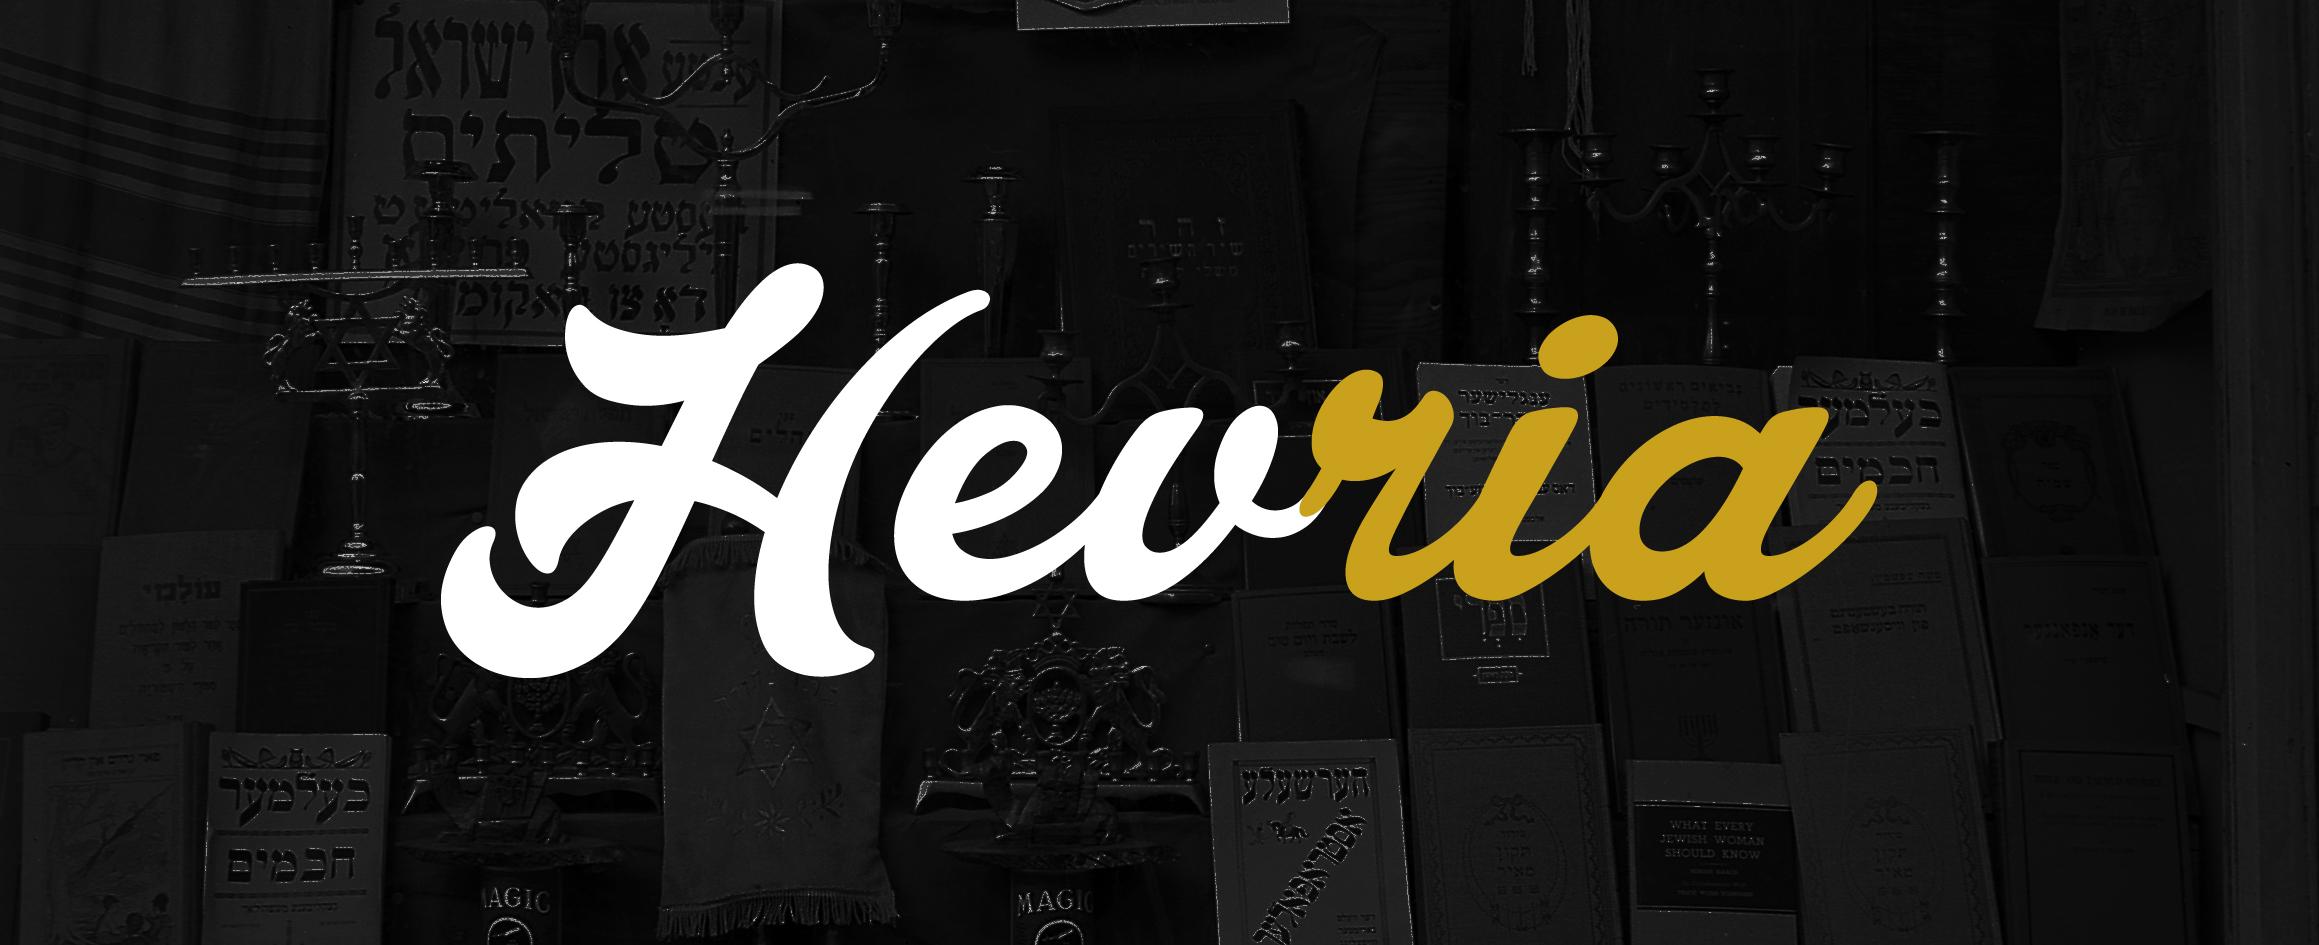 hevria1